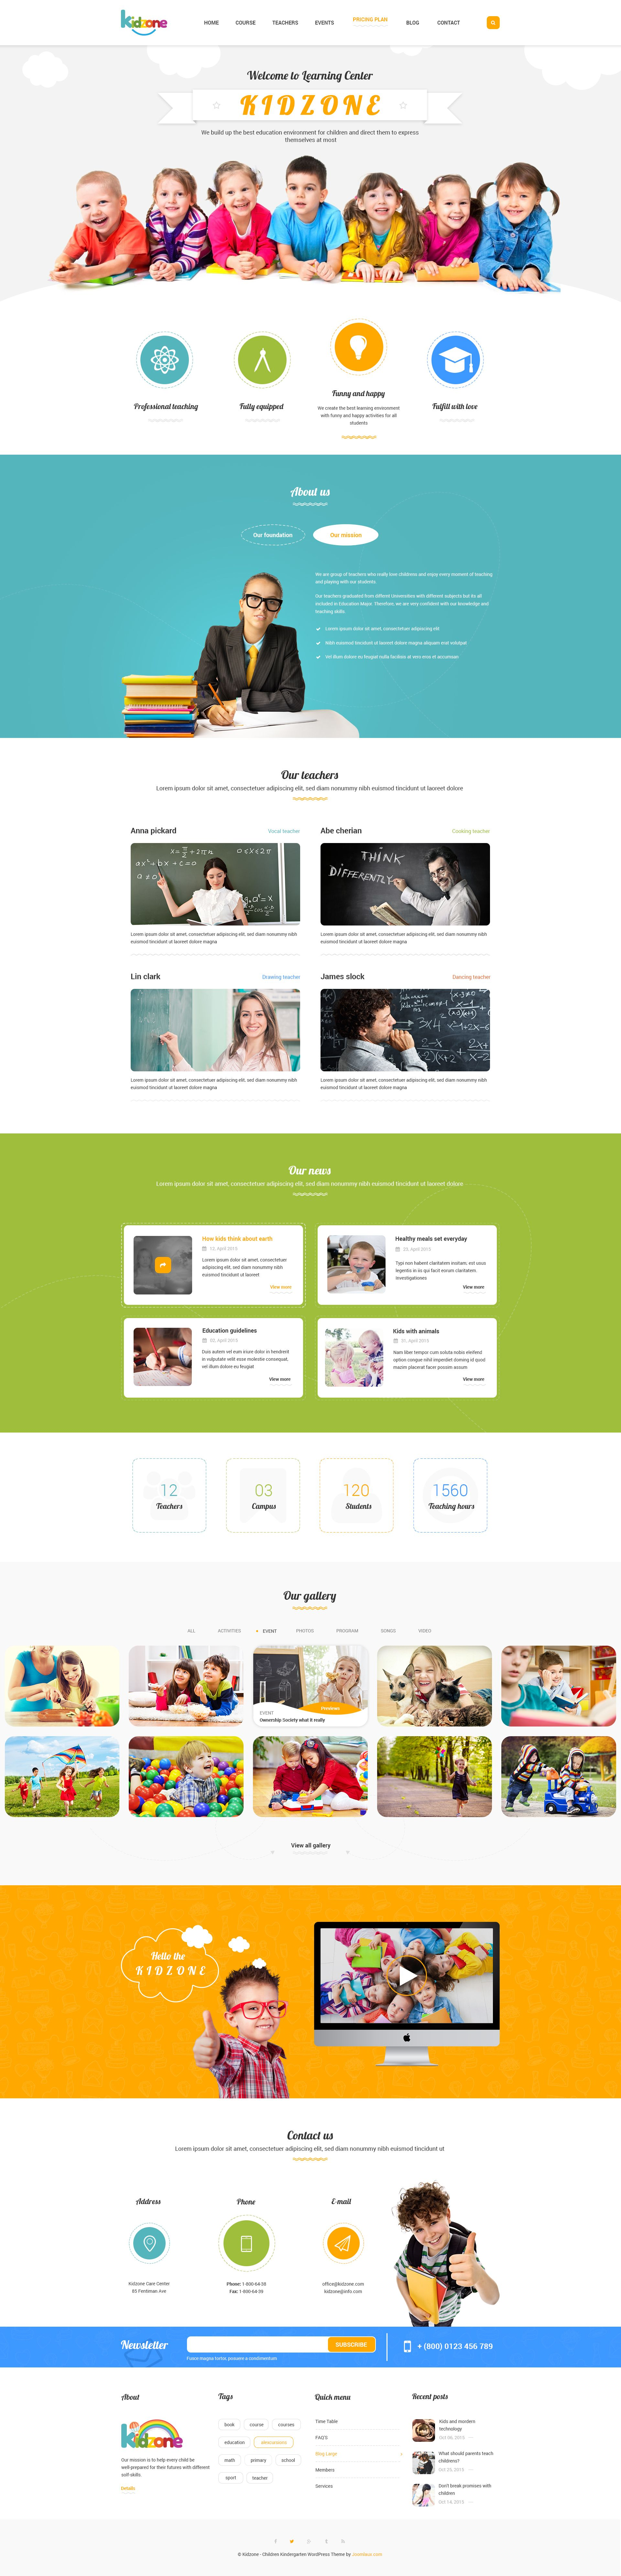 kidzone primary school for children psd website design by dj